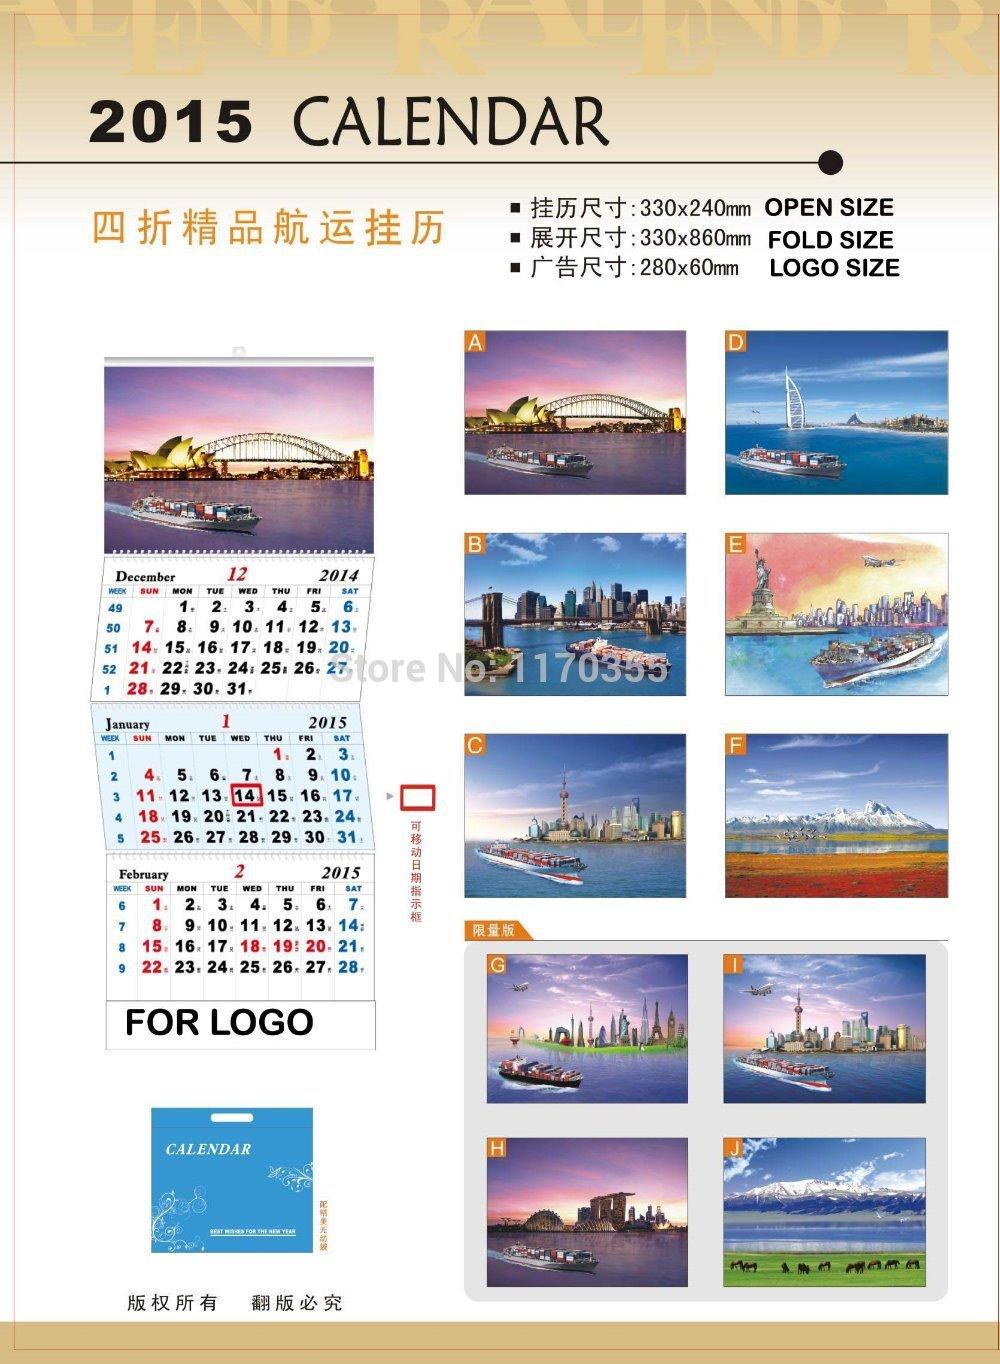 Календари с логотипом - Офсет-Экспресс